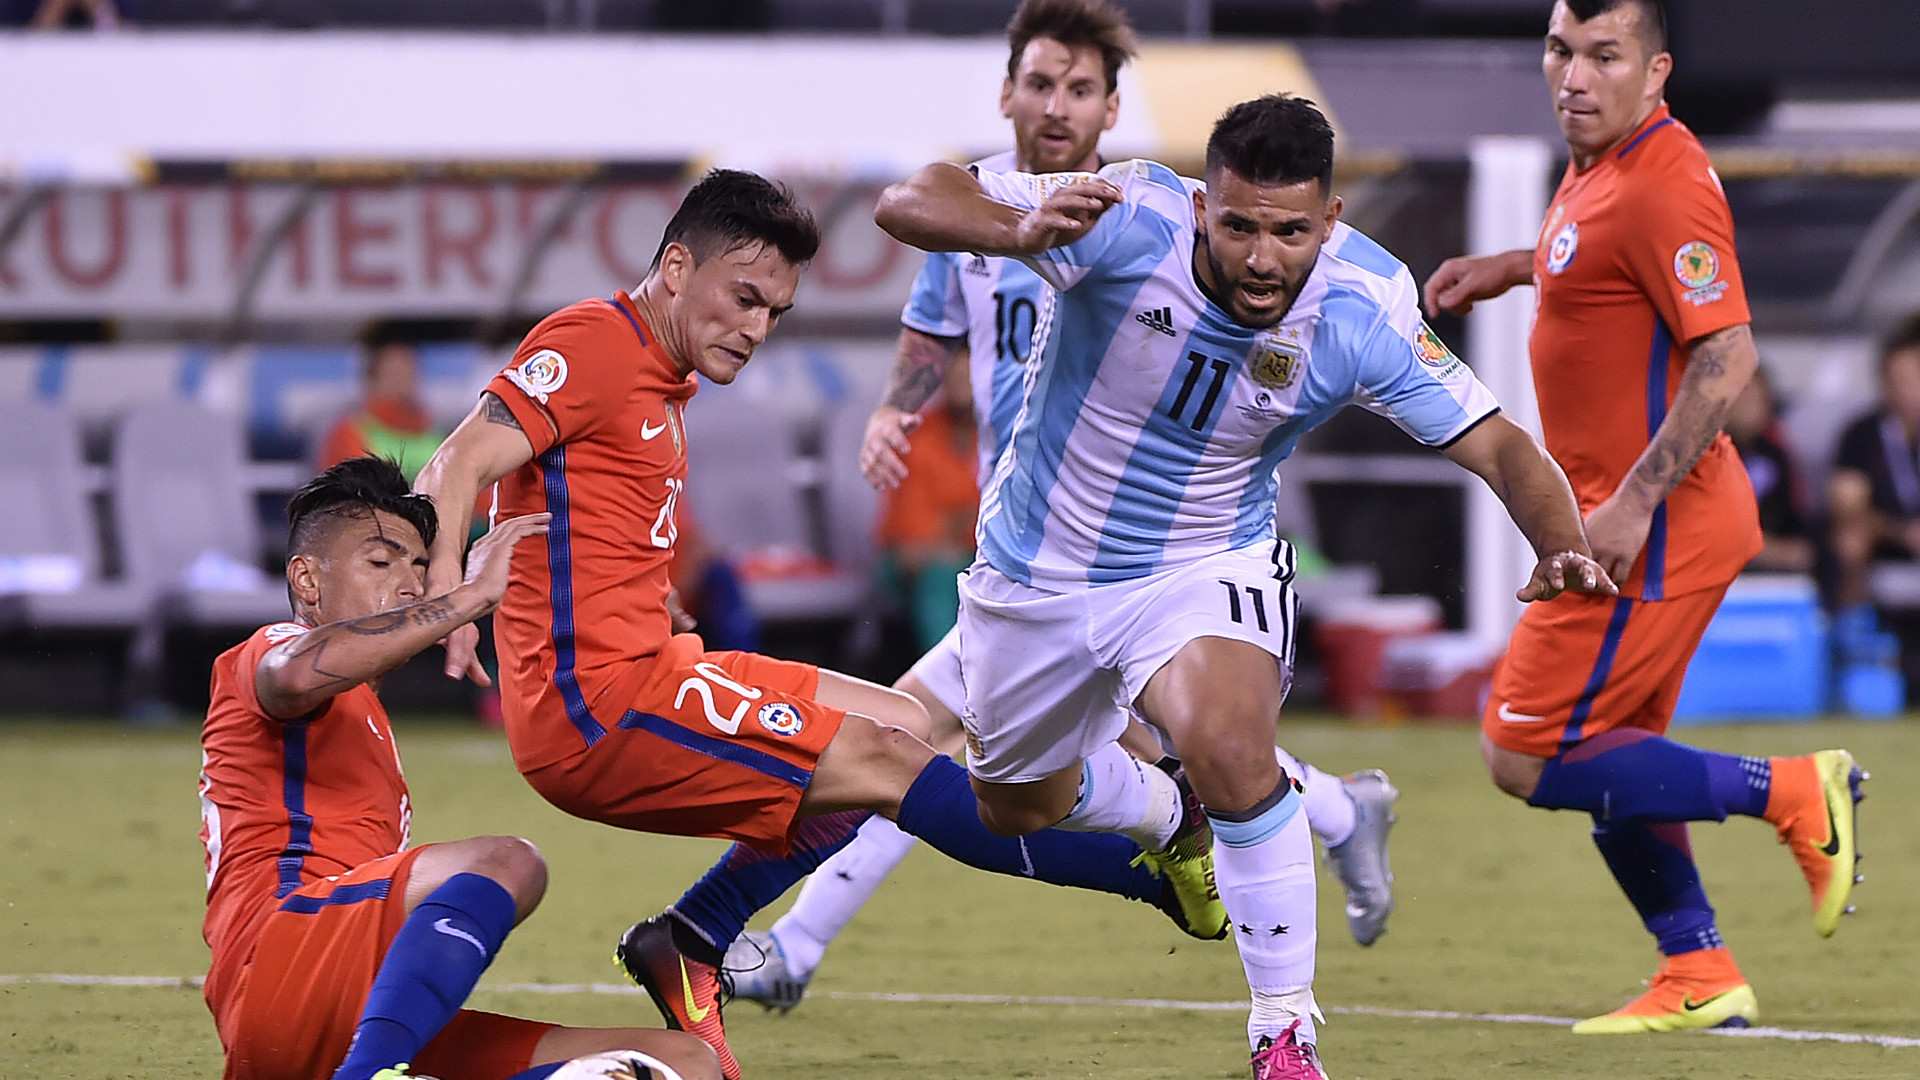 Sergio Aguero Argentina Chile Final Copa America Centenario 26062016